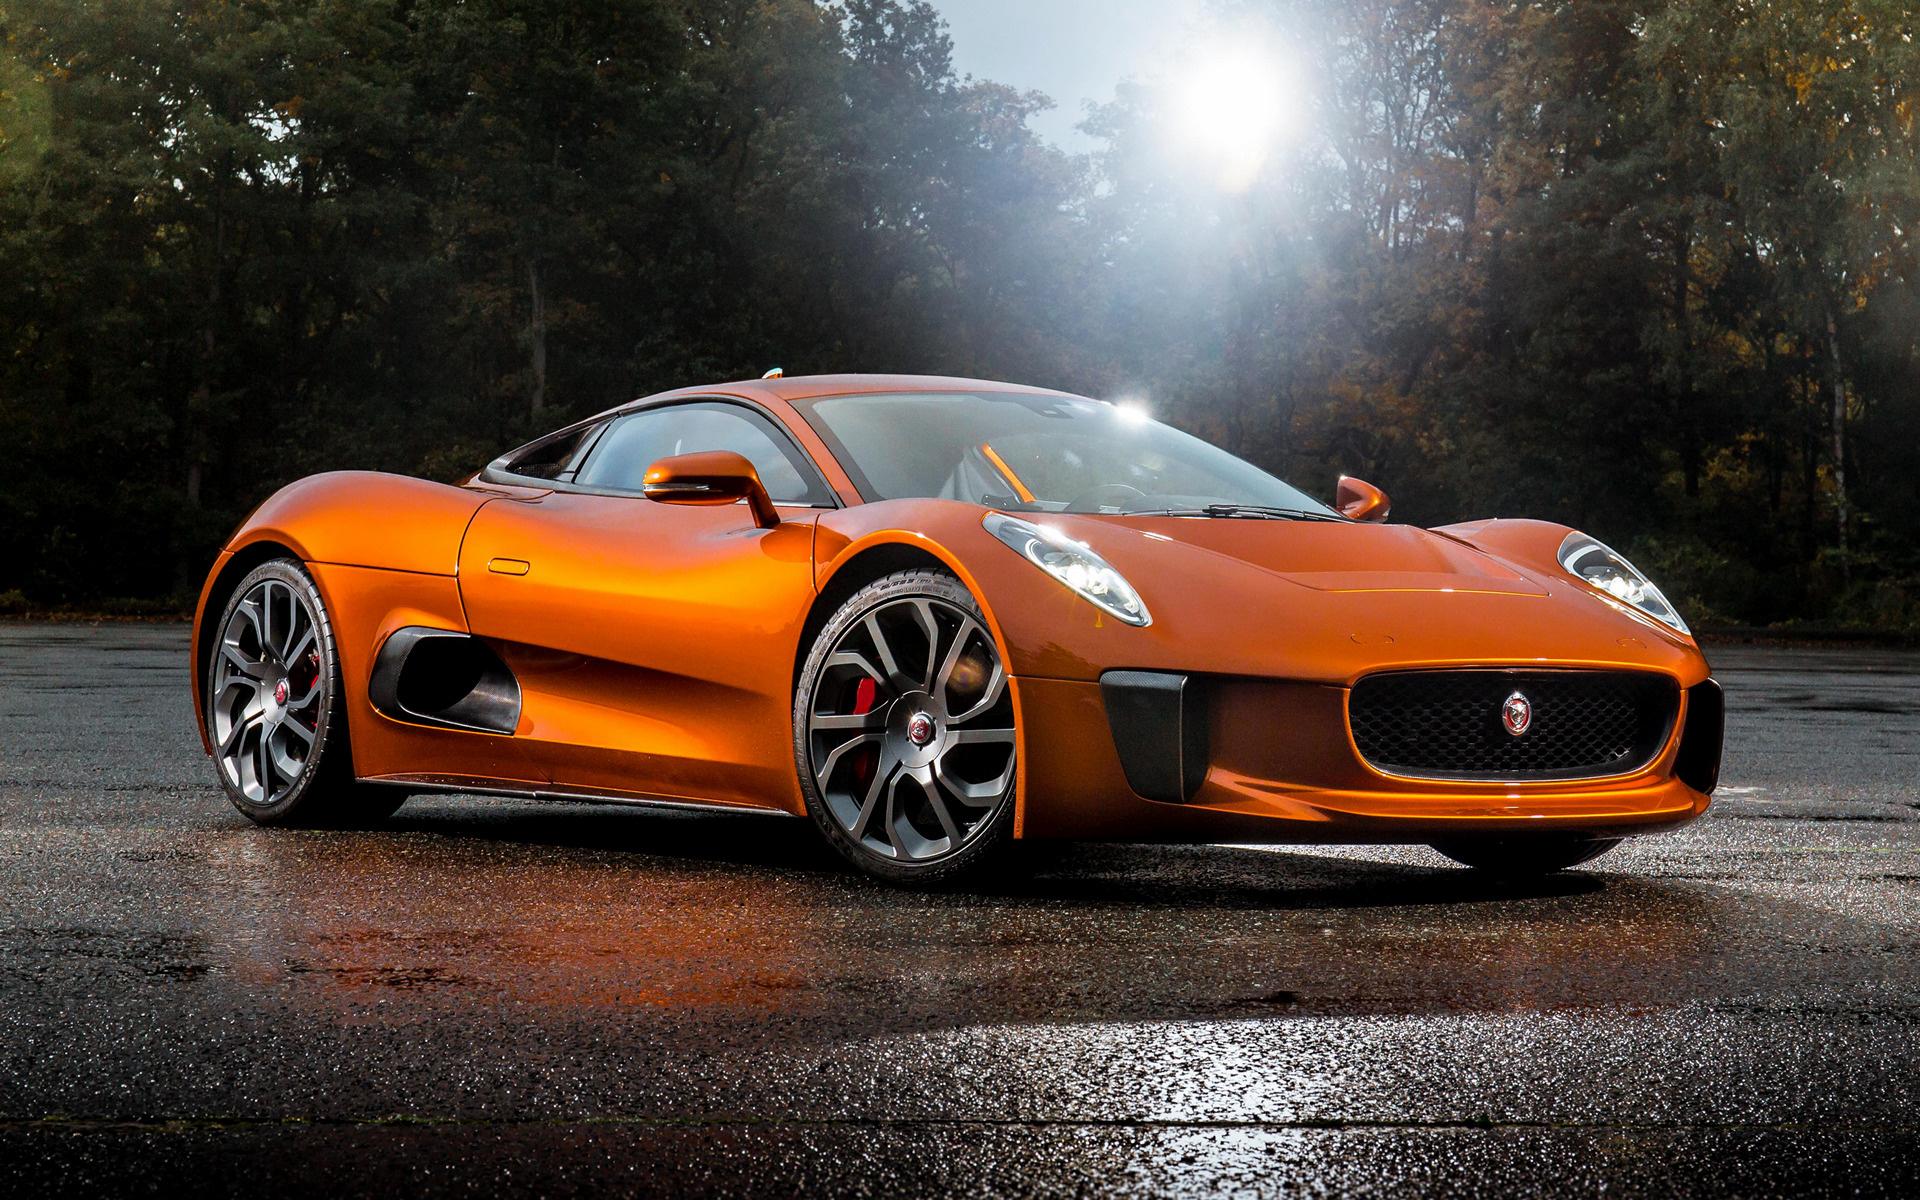 Jaguar C-X75 007 Spectre (2015) Wallpapers and HD Images ...